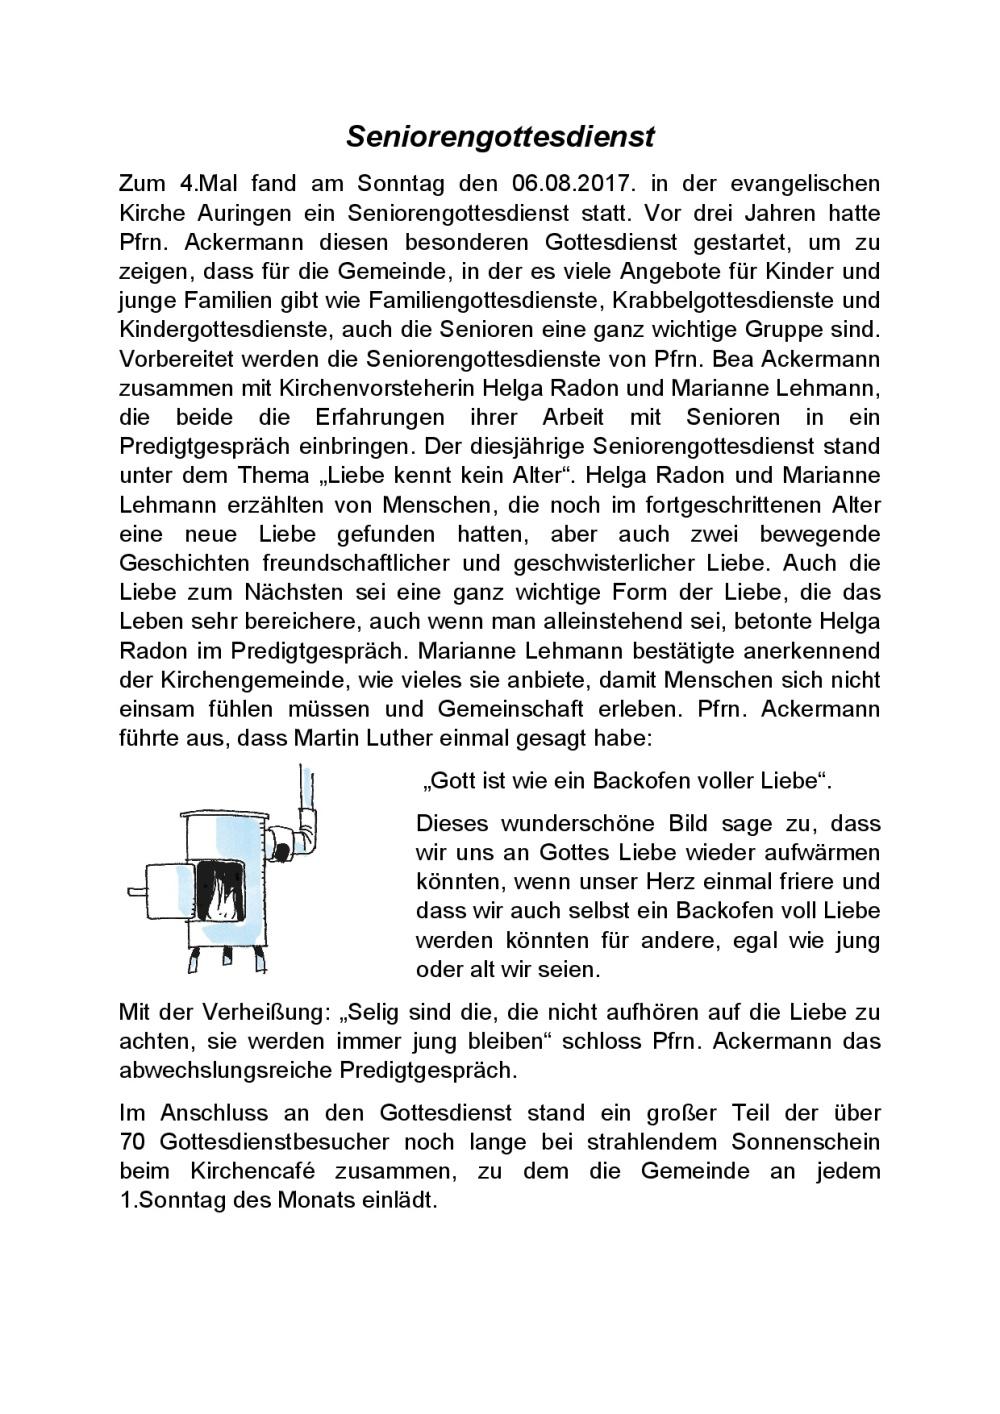 2017-08-06 Seniorengottesdienst-001